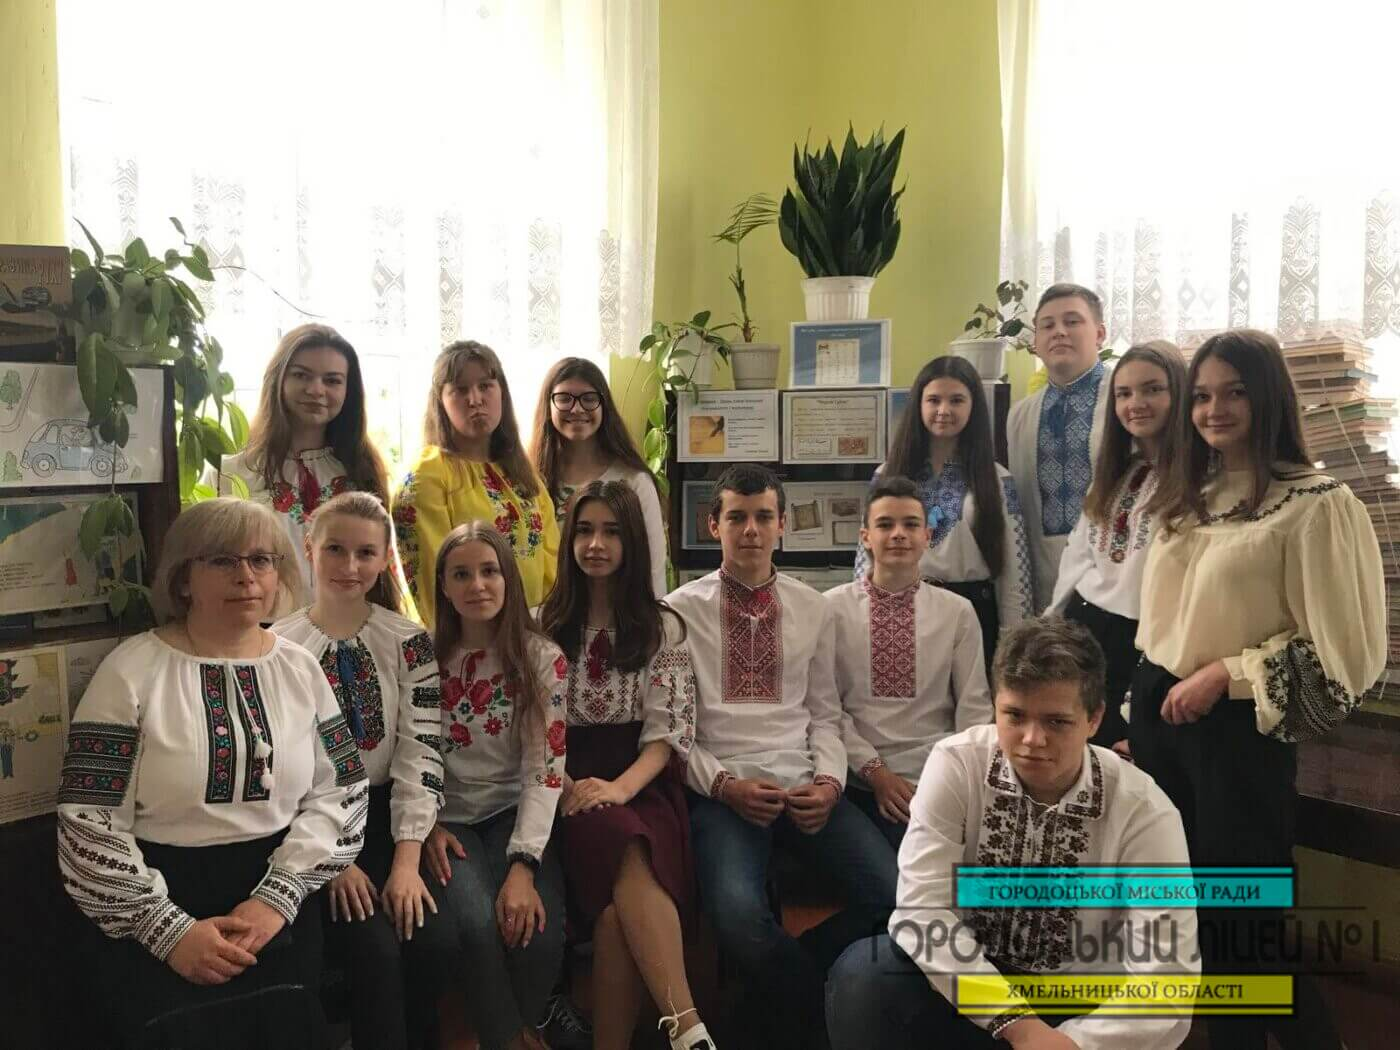 zobrazhennya viber 2021 05 24 13 27 49 1400x1050 - 24 травня – День слов'янської писемності і культури